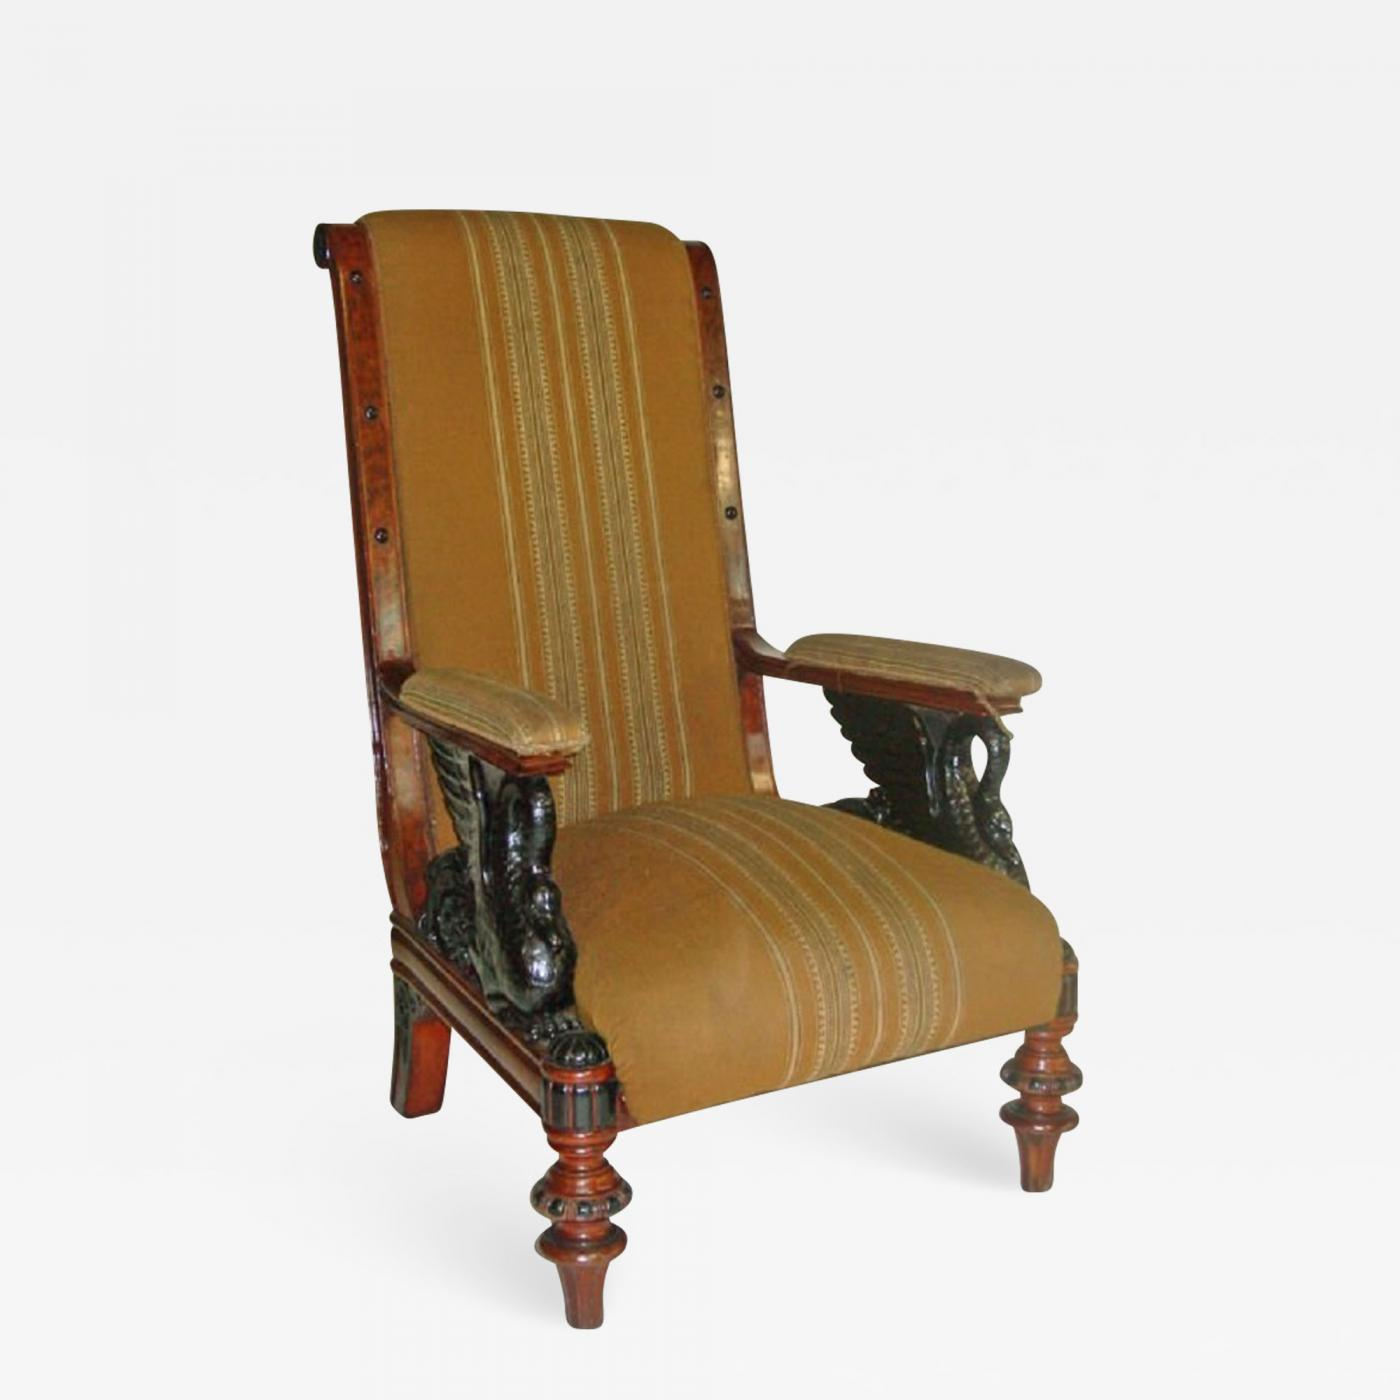 unusual armchair teak bath chair austrian 19th century biedermeier library listings furniture seating easy chairs